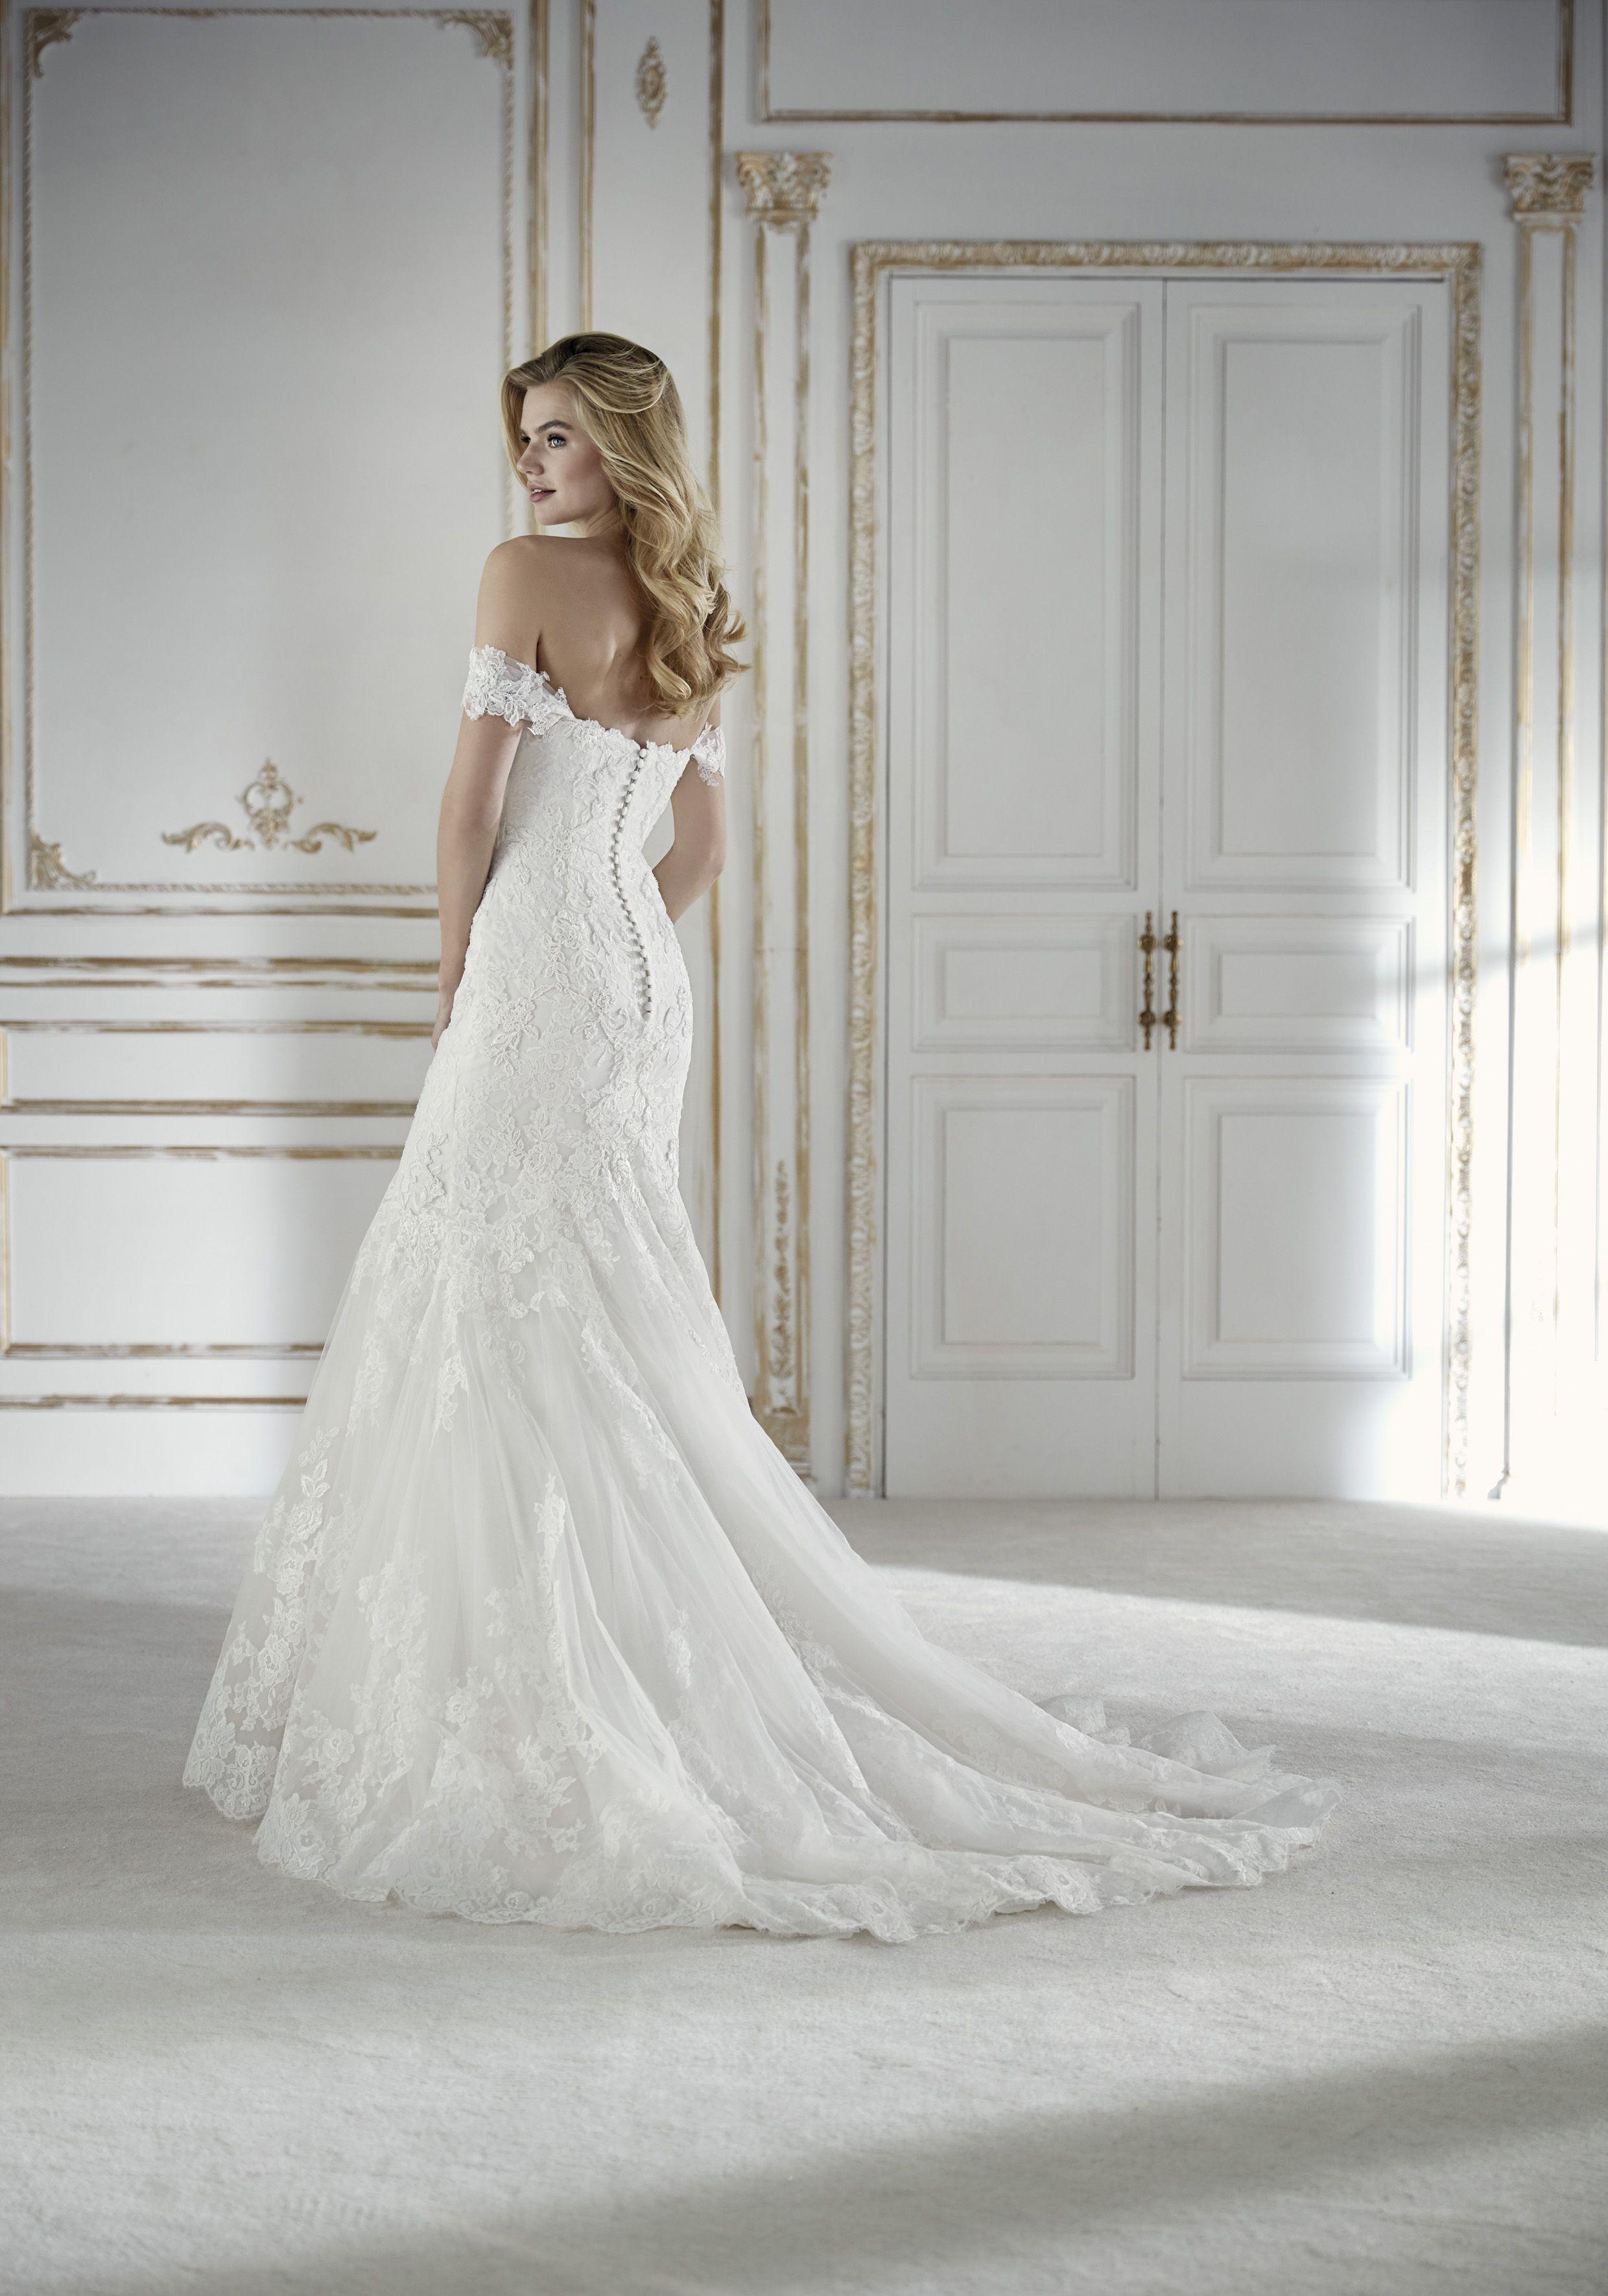 Boutique de vestidos de novia en polanco